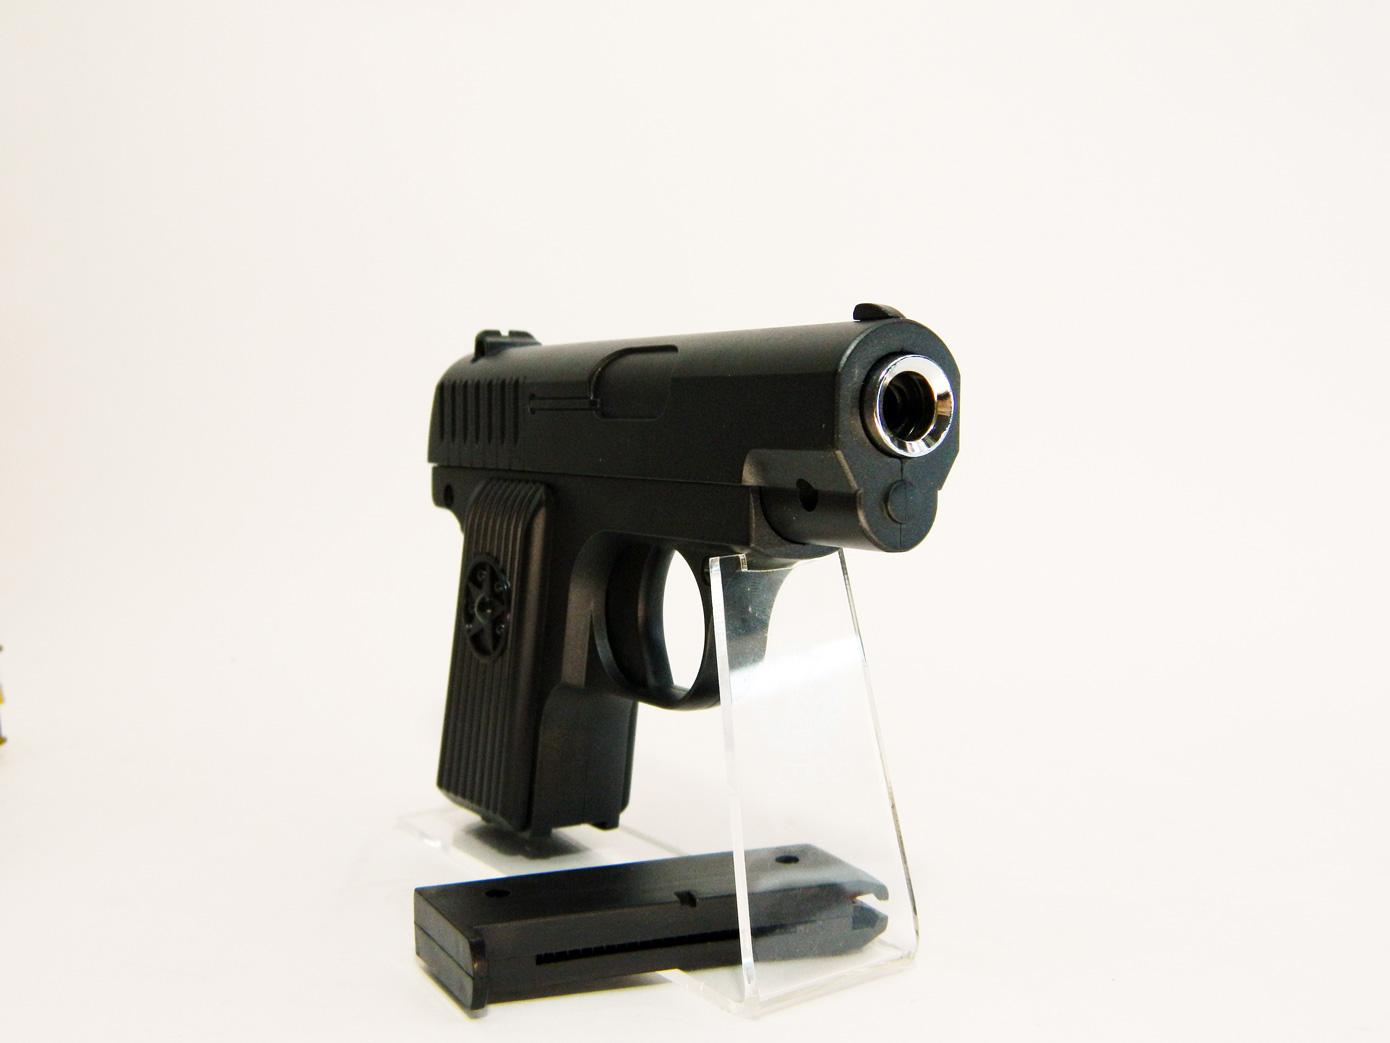 Пистолет ТТ мини изображение 3